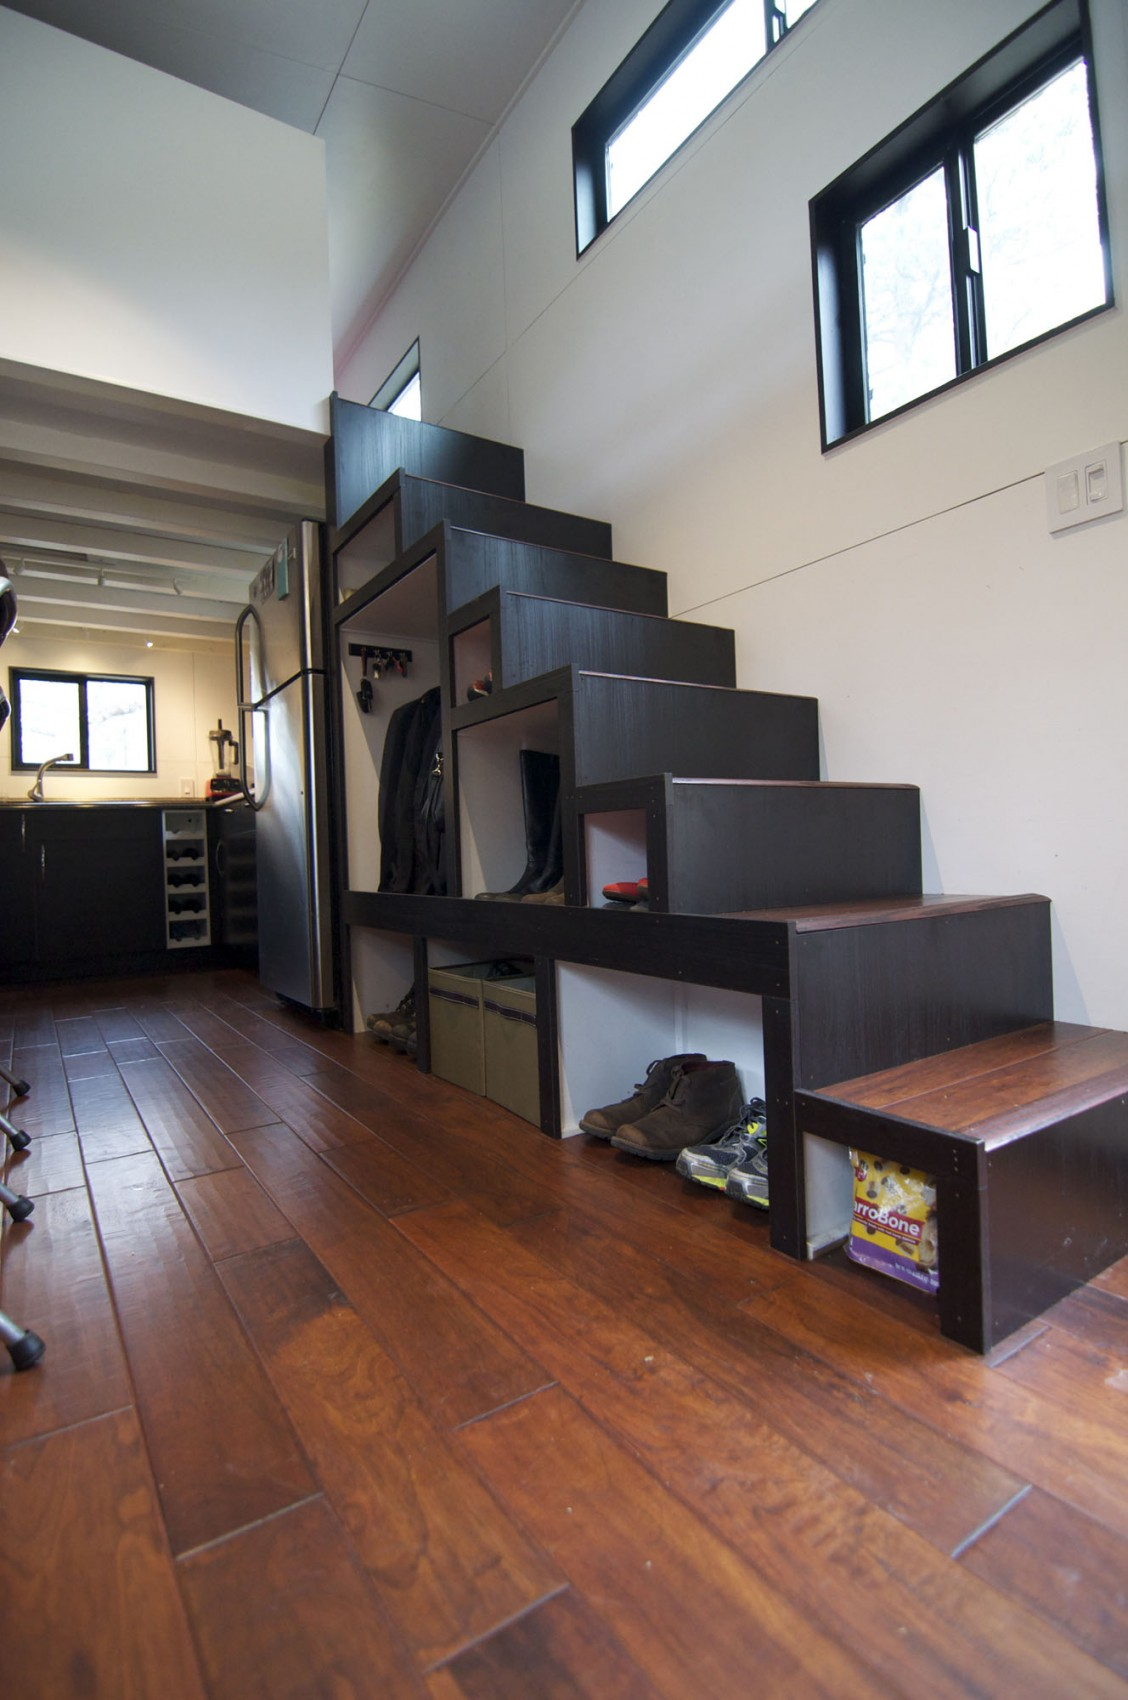 Полки для хранения под лестницей